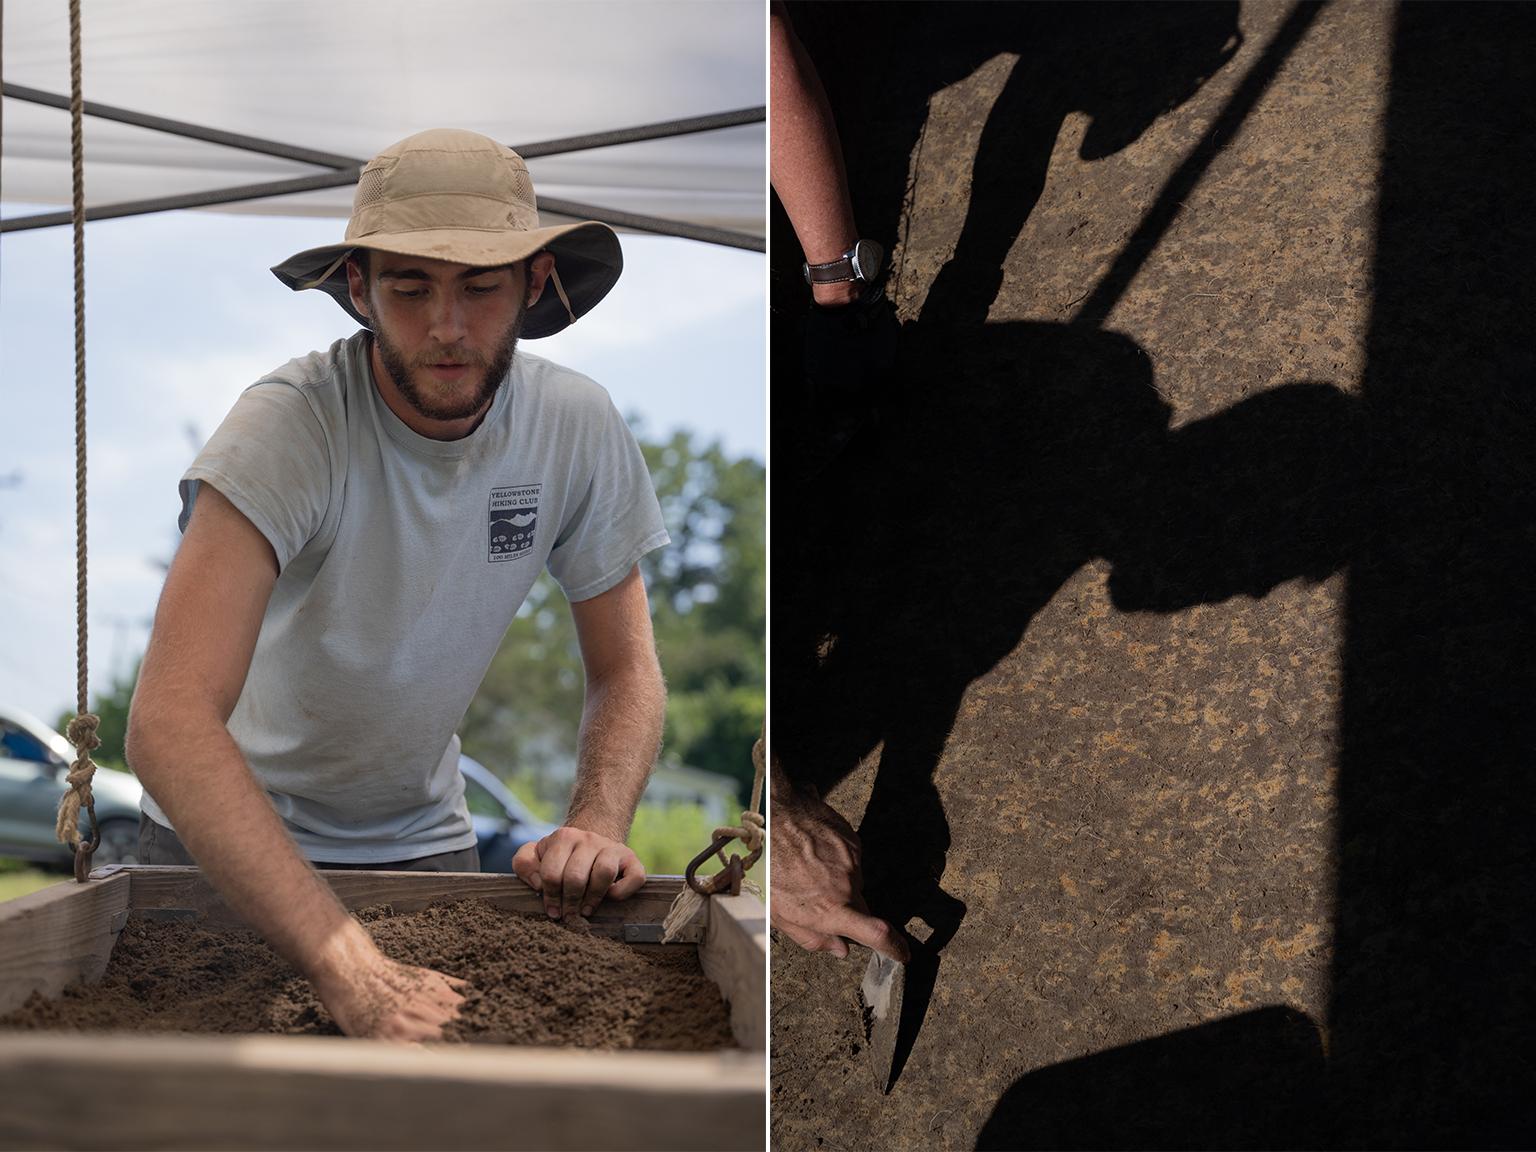 Evan Cabral digs through dirt